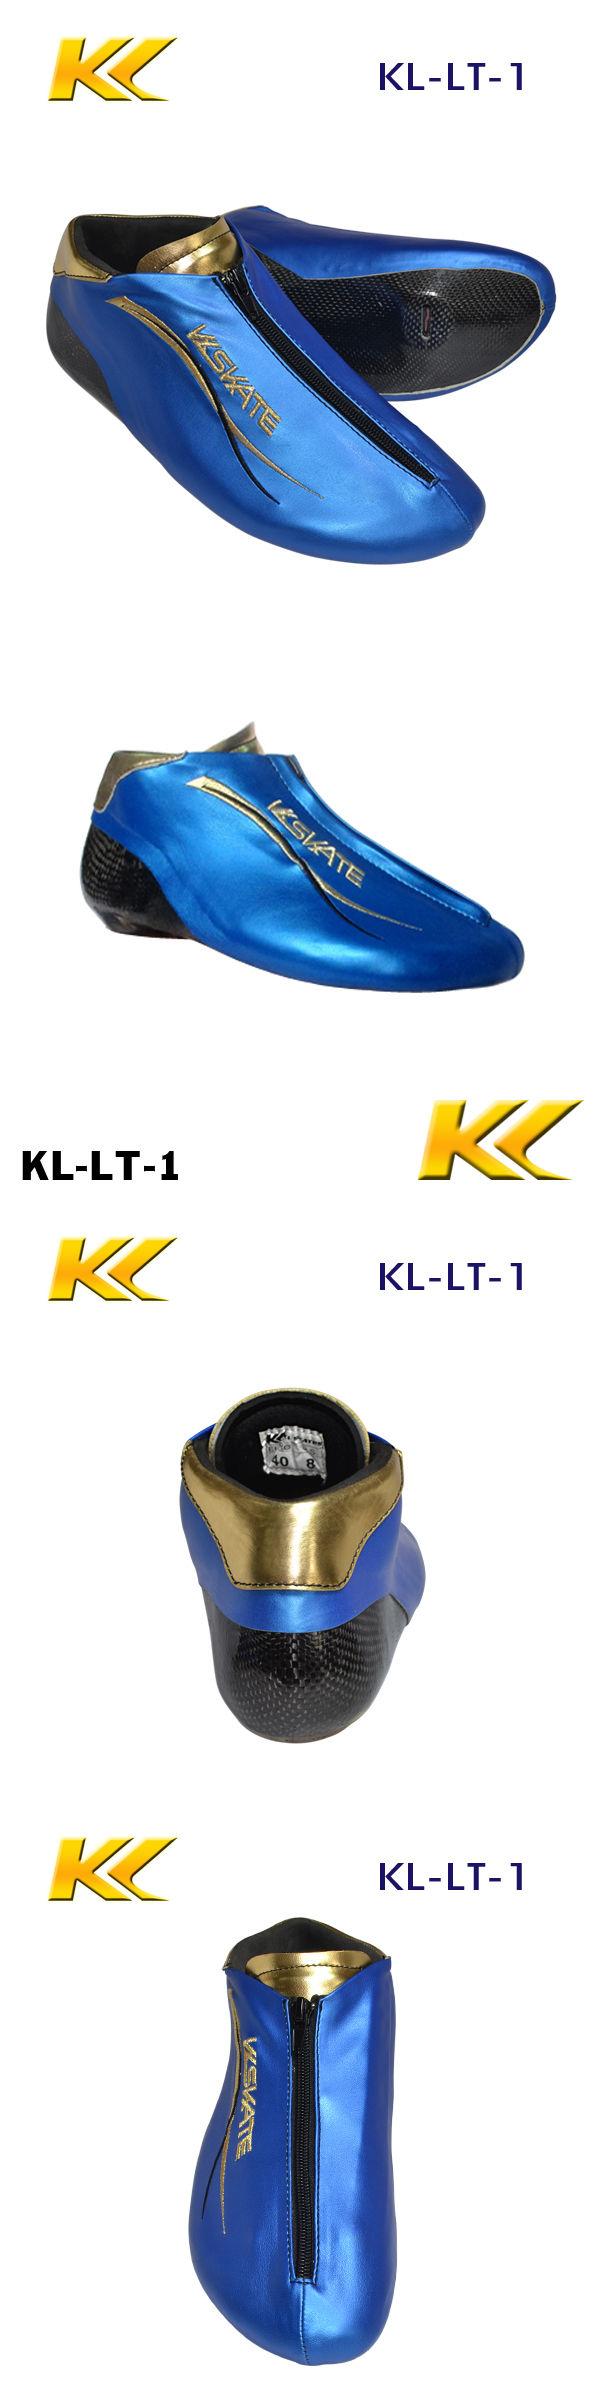 Men 26345: Kl Skate Long Track Ice Skate Boot, Clap Skate Ice Boot For Size 34 To 46 -> BUY IT NOW ONLY: $166.32 on eBay!